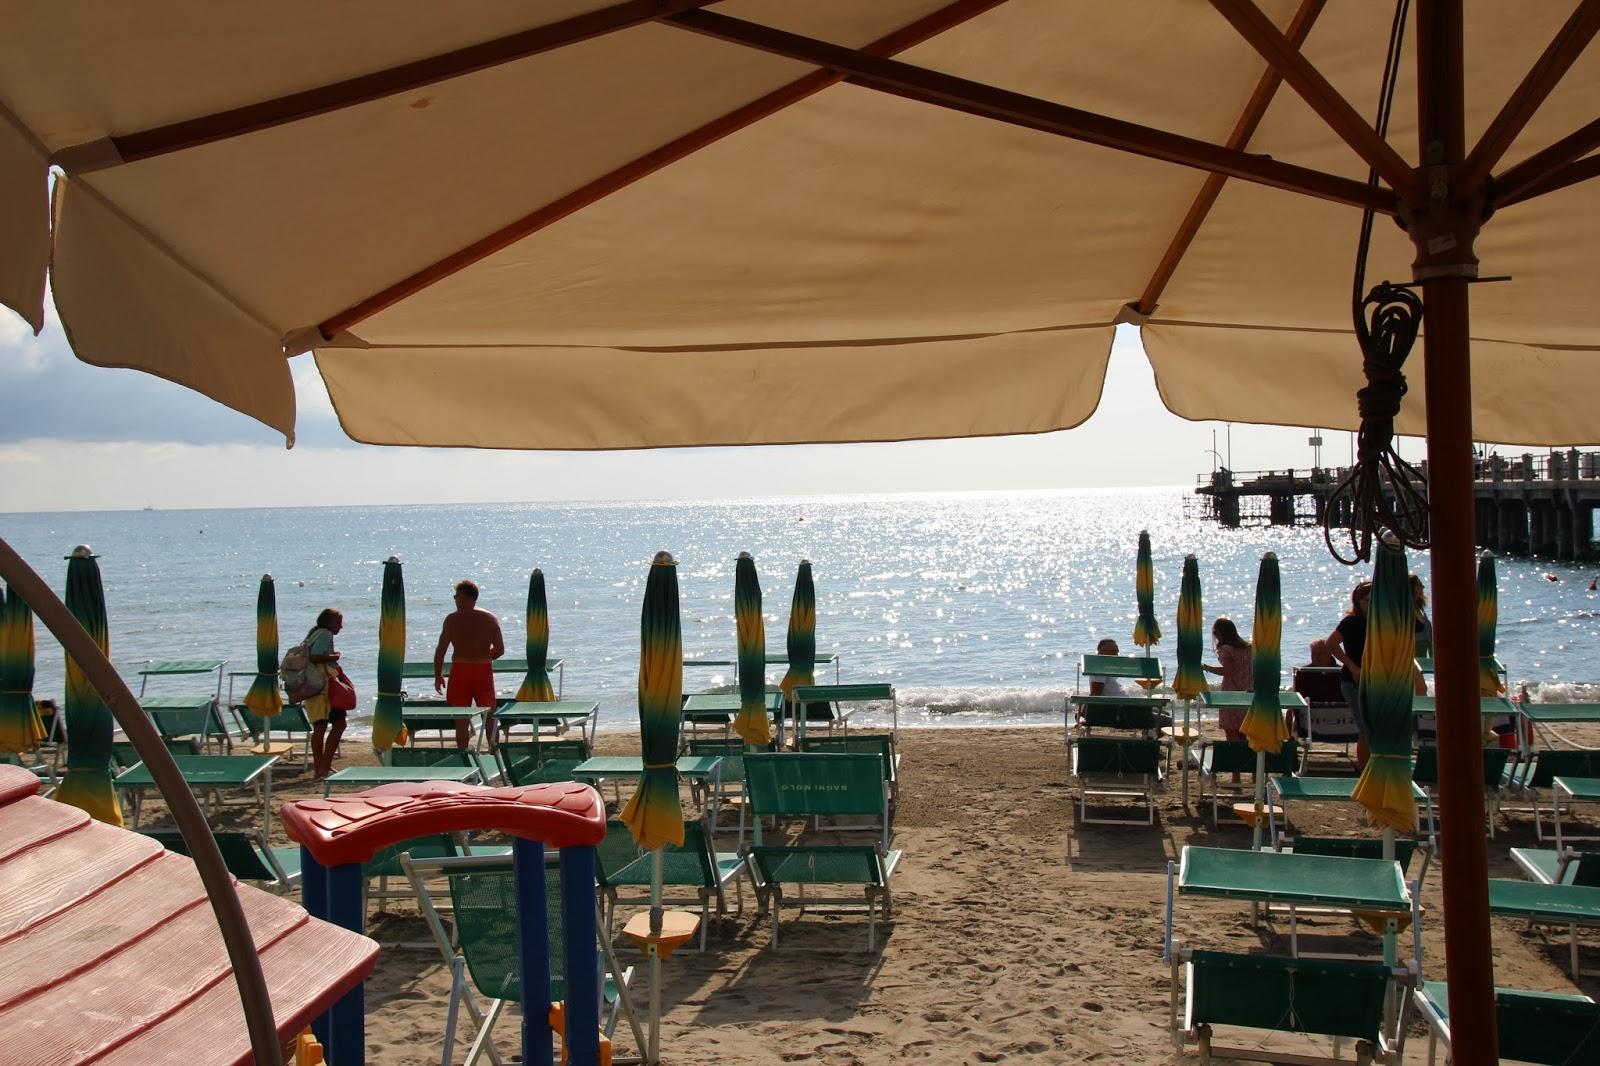 www.alassio.nl, www.italiaansebloemenriviera.nl Vakantiehuizen Italië, vakantiehuis bloemenrivièra, vakantiehuizen bloemenrivièra, vakantiehuizen Ligurië, vakantiewoningen bloemenrivièra, vakantiehuis huren Italië, vakantieappartementen Italië, accommodatie bloemenrivièra, vakantiehuizen bloemenrivièra Italië, autovakantie bloemenrivièra, huisje bloemenrivièra, huis huren Italië bloemenrivièra, bloemenrivièra bungalow, vakantiehuizen Ligurië, vakantievilla bloemenrivièra, vakantiehuisje bloemenrivièra, vakantie bloemenrivièra 2015, vakantiehuis Ligurië, bloemenrivièra Agriturismo, bloemenrivièra vakantiepark, vakantie bloemenrivièra, bloemenrivièra Italië, vakantiehuis Italië, vakantiewoning bloemenrivièra